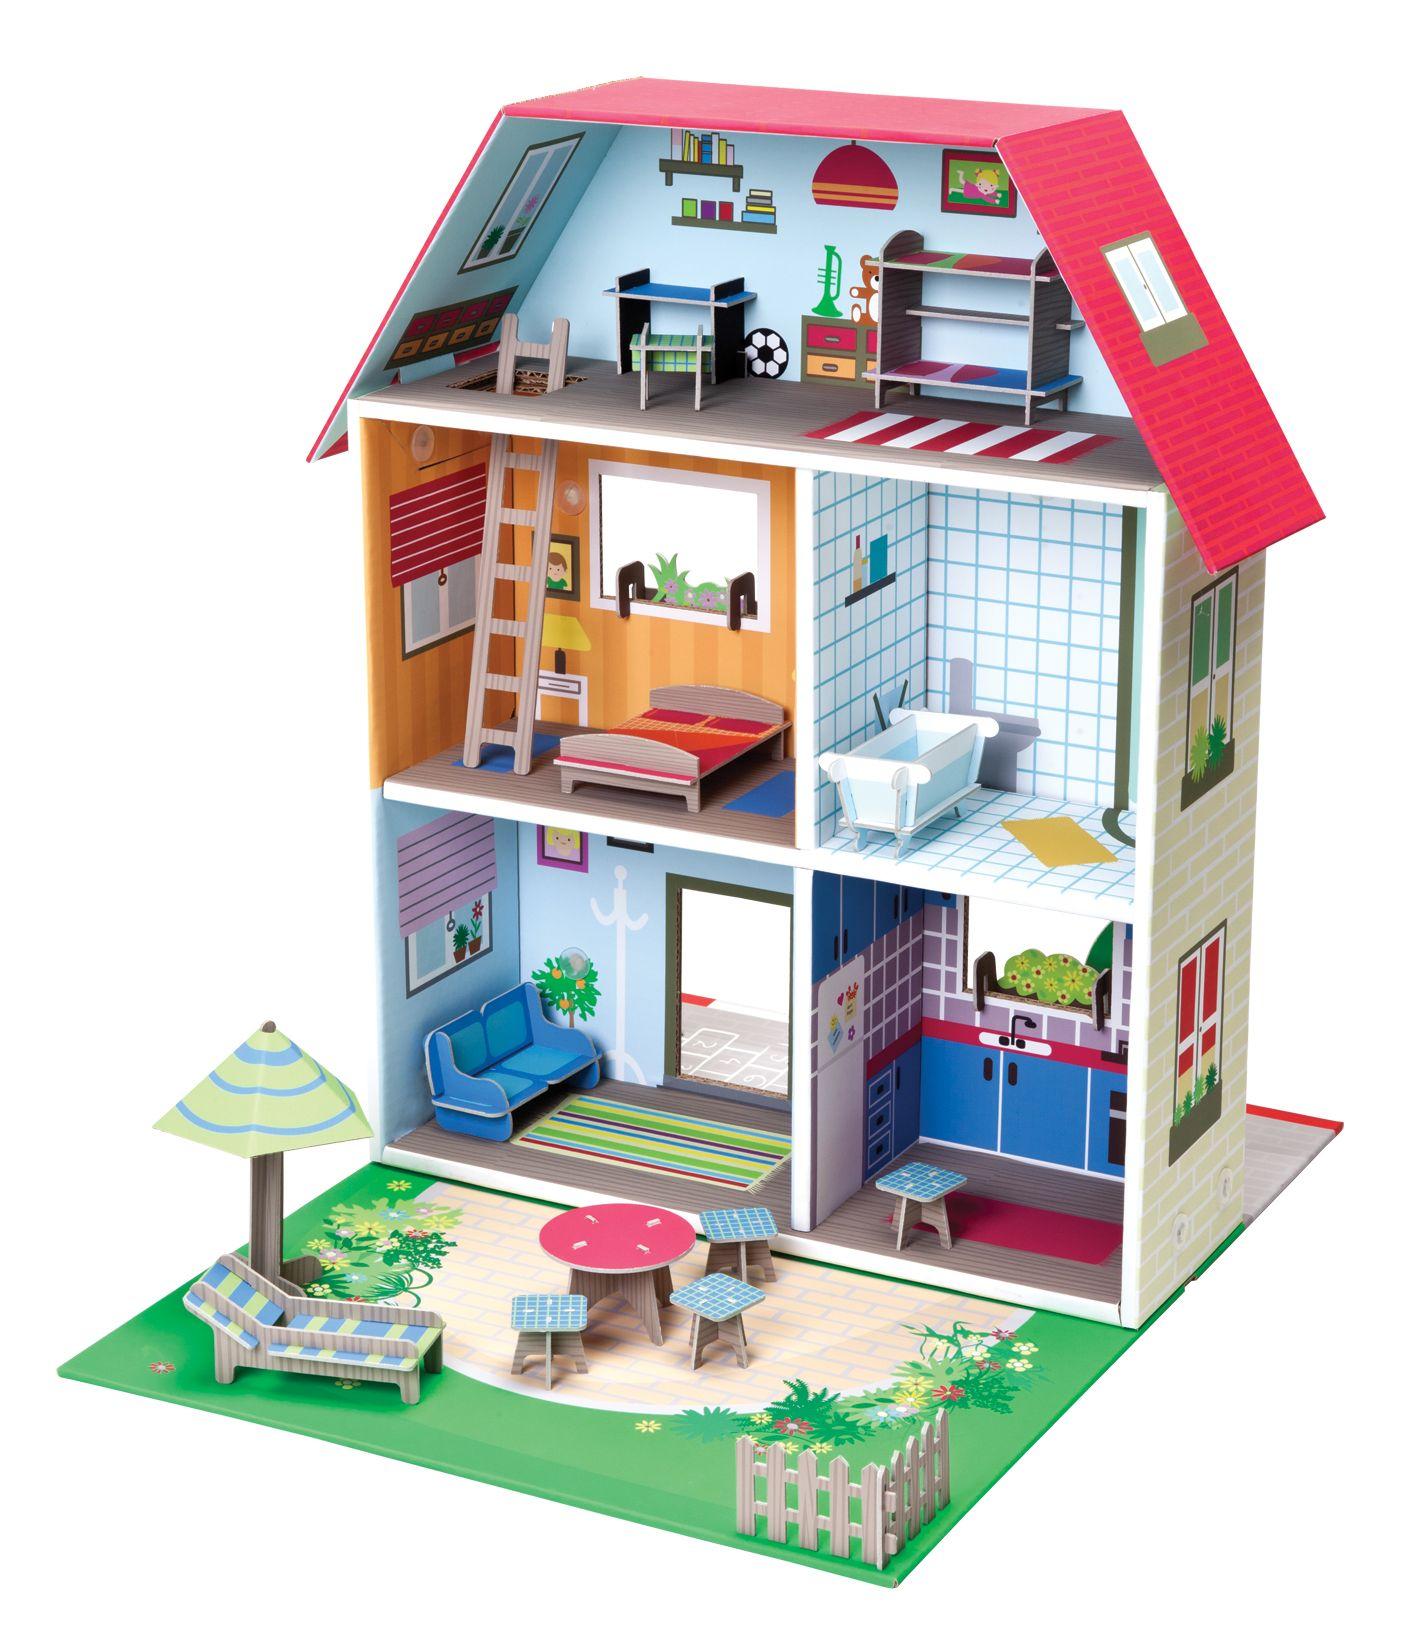 Casa de mu ecas murielle casa duendes china pinterest mu ecas Casas hechas de carton